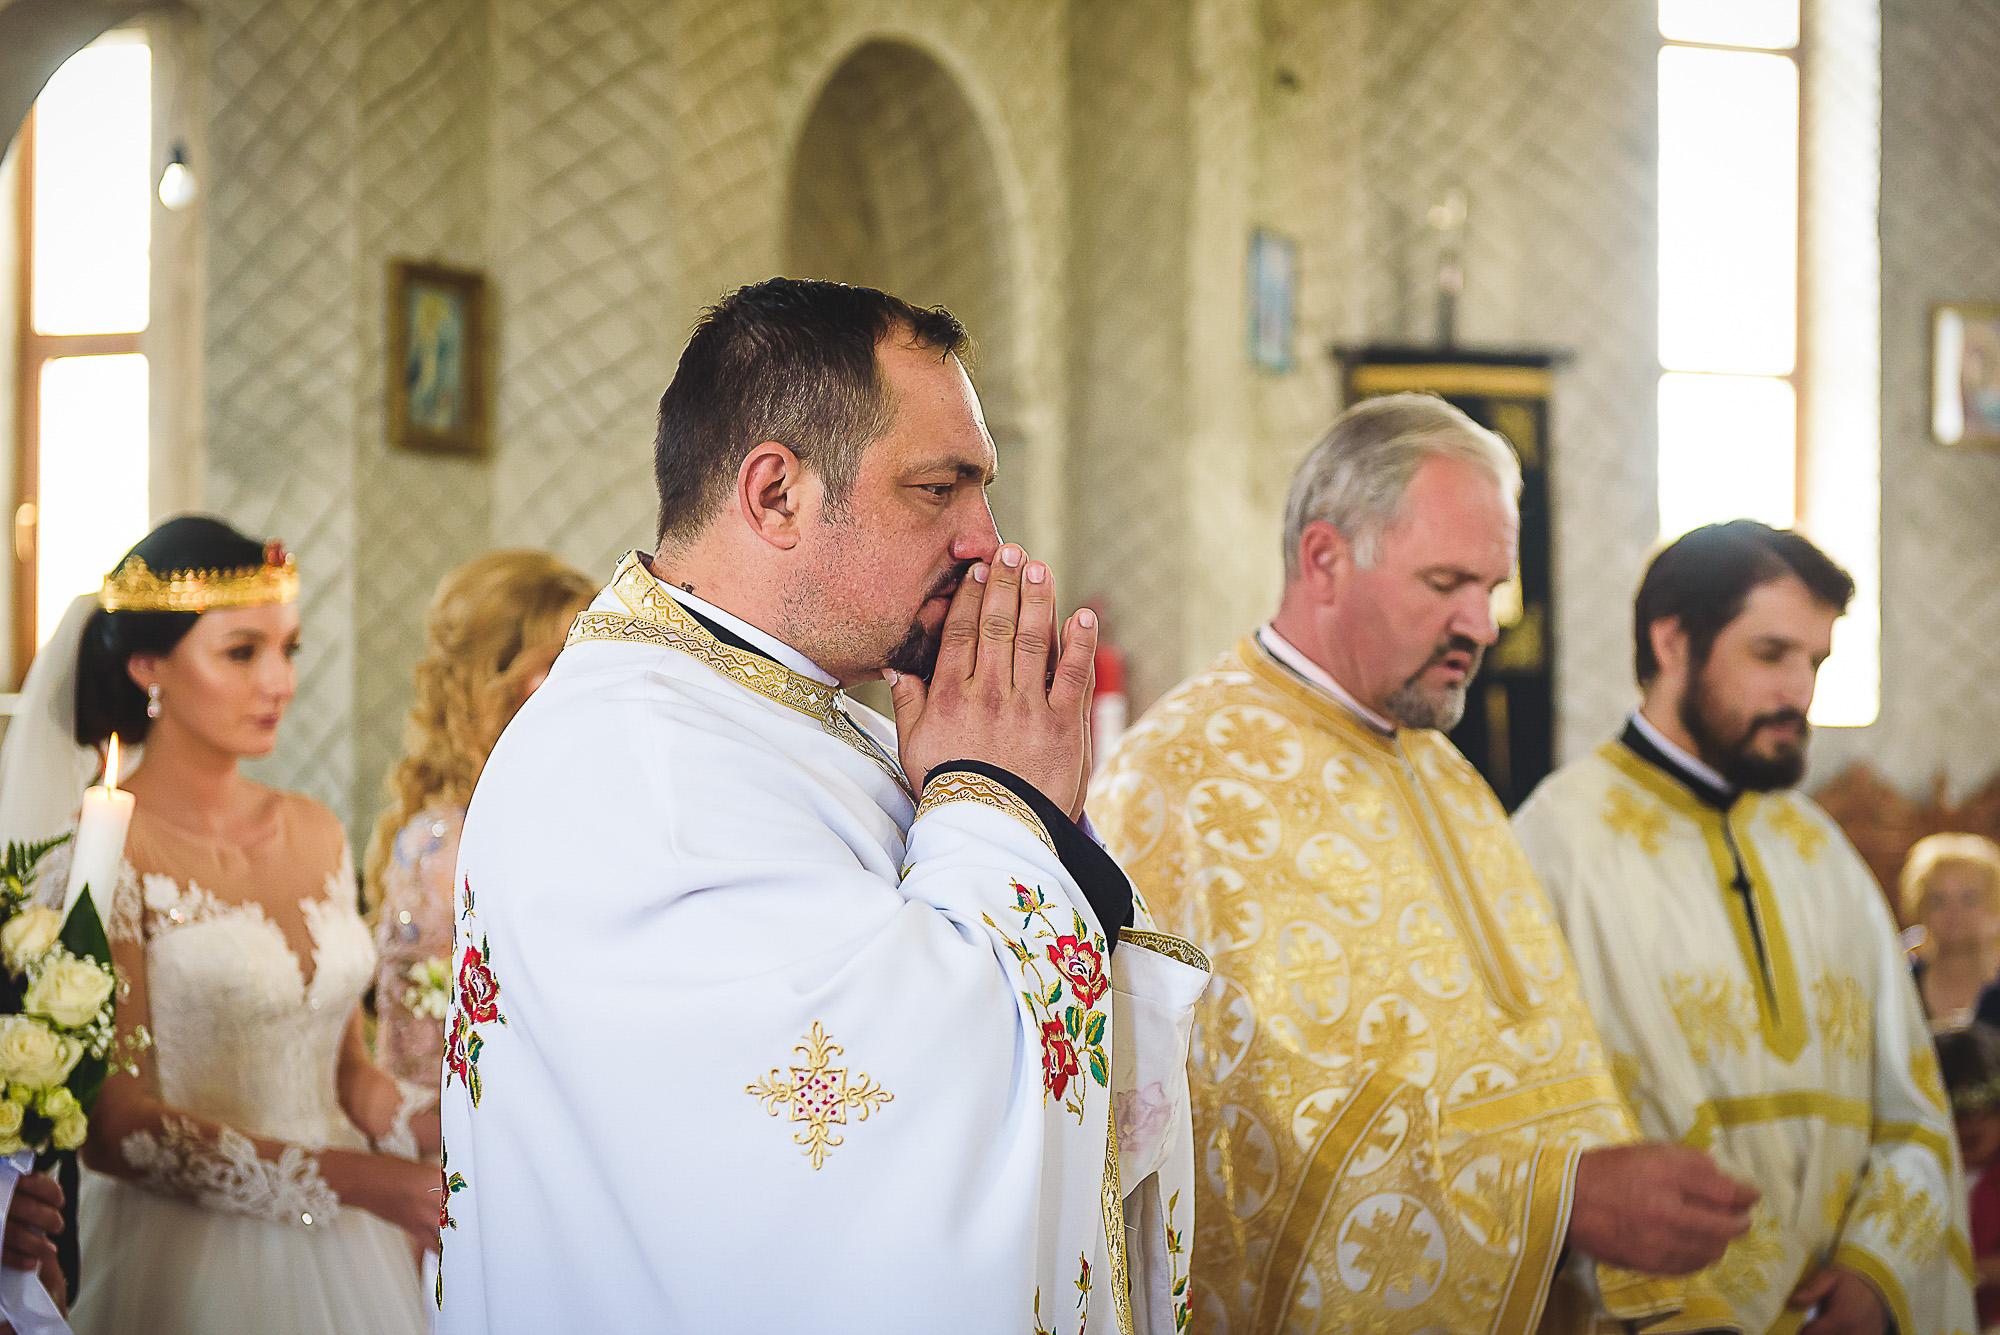 preotul se roaga pentru miri, cununia religioasa, biserica ortodoxa, fotografie creativa de nunta, fotograf nunta mures, foto nunta reghin, foto video reghin, foto video nunta mures